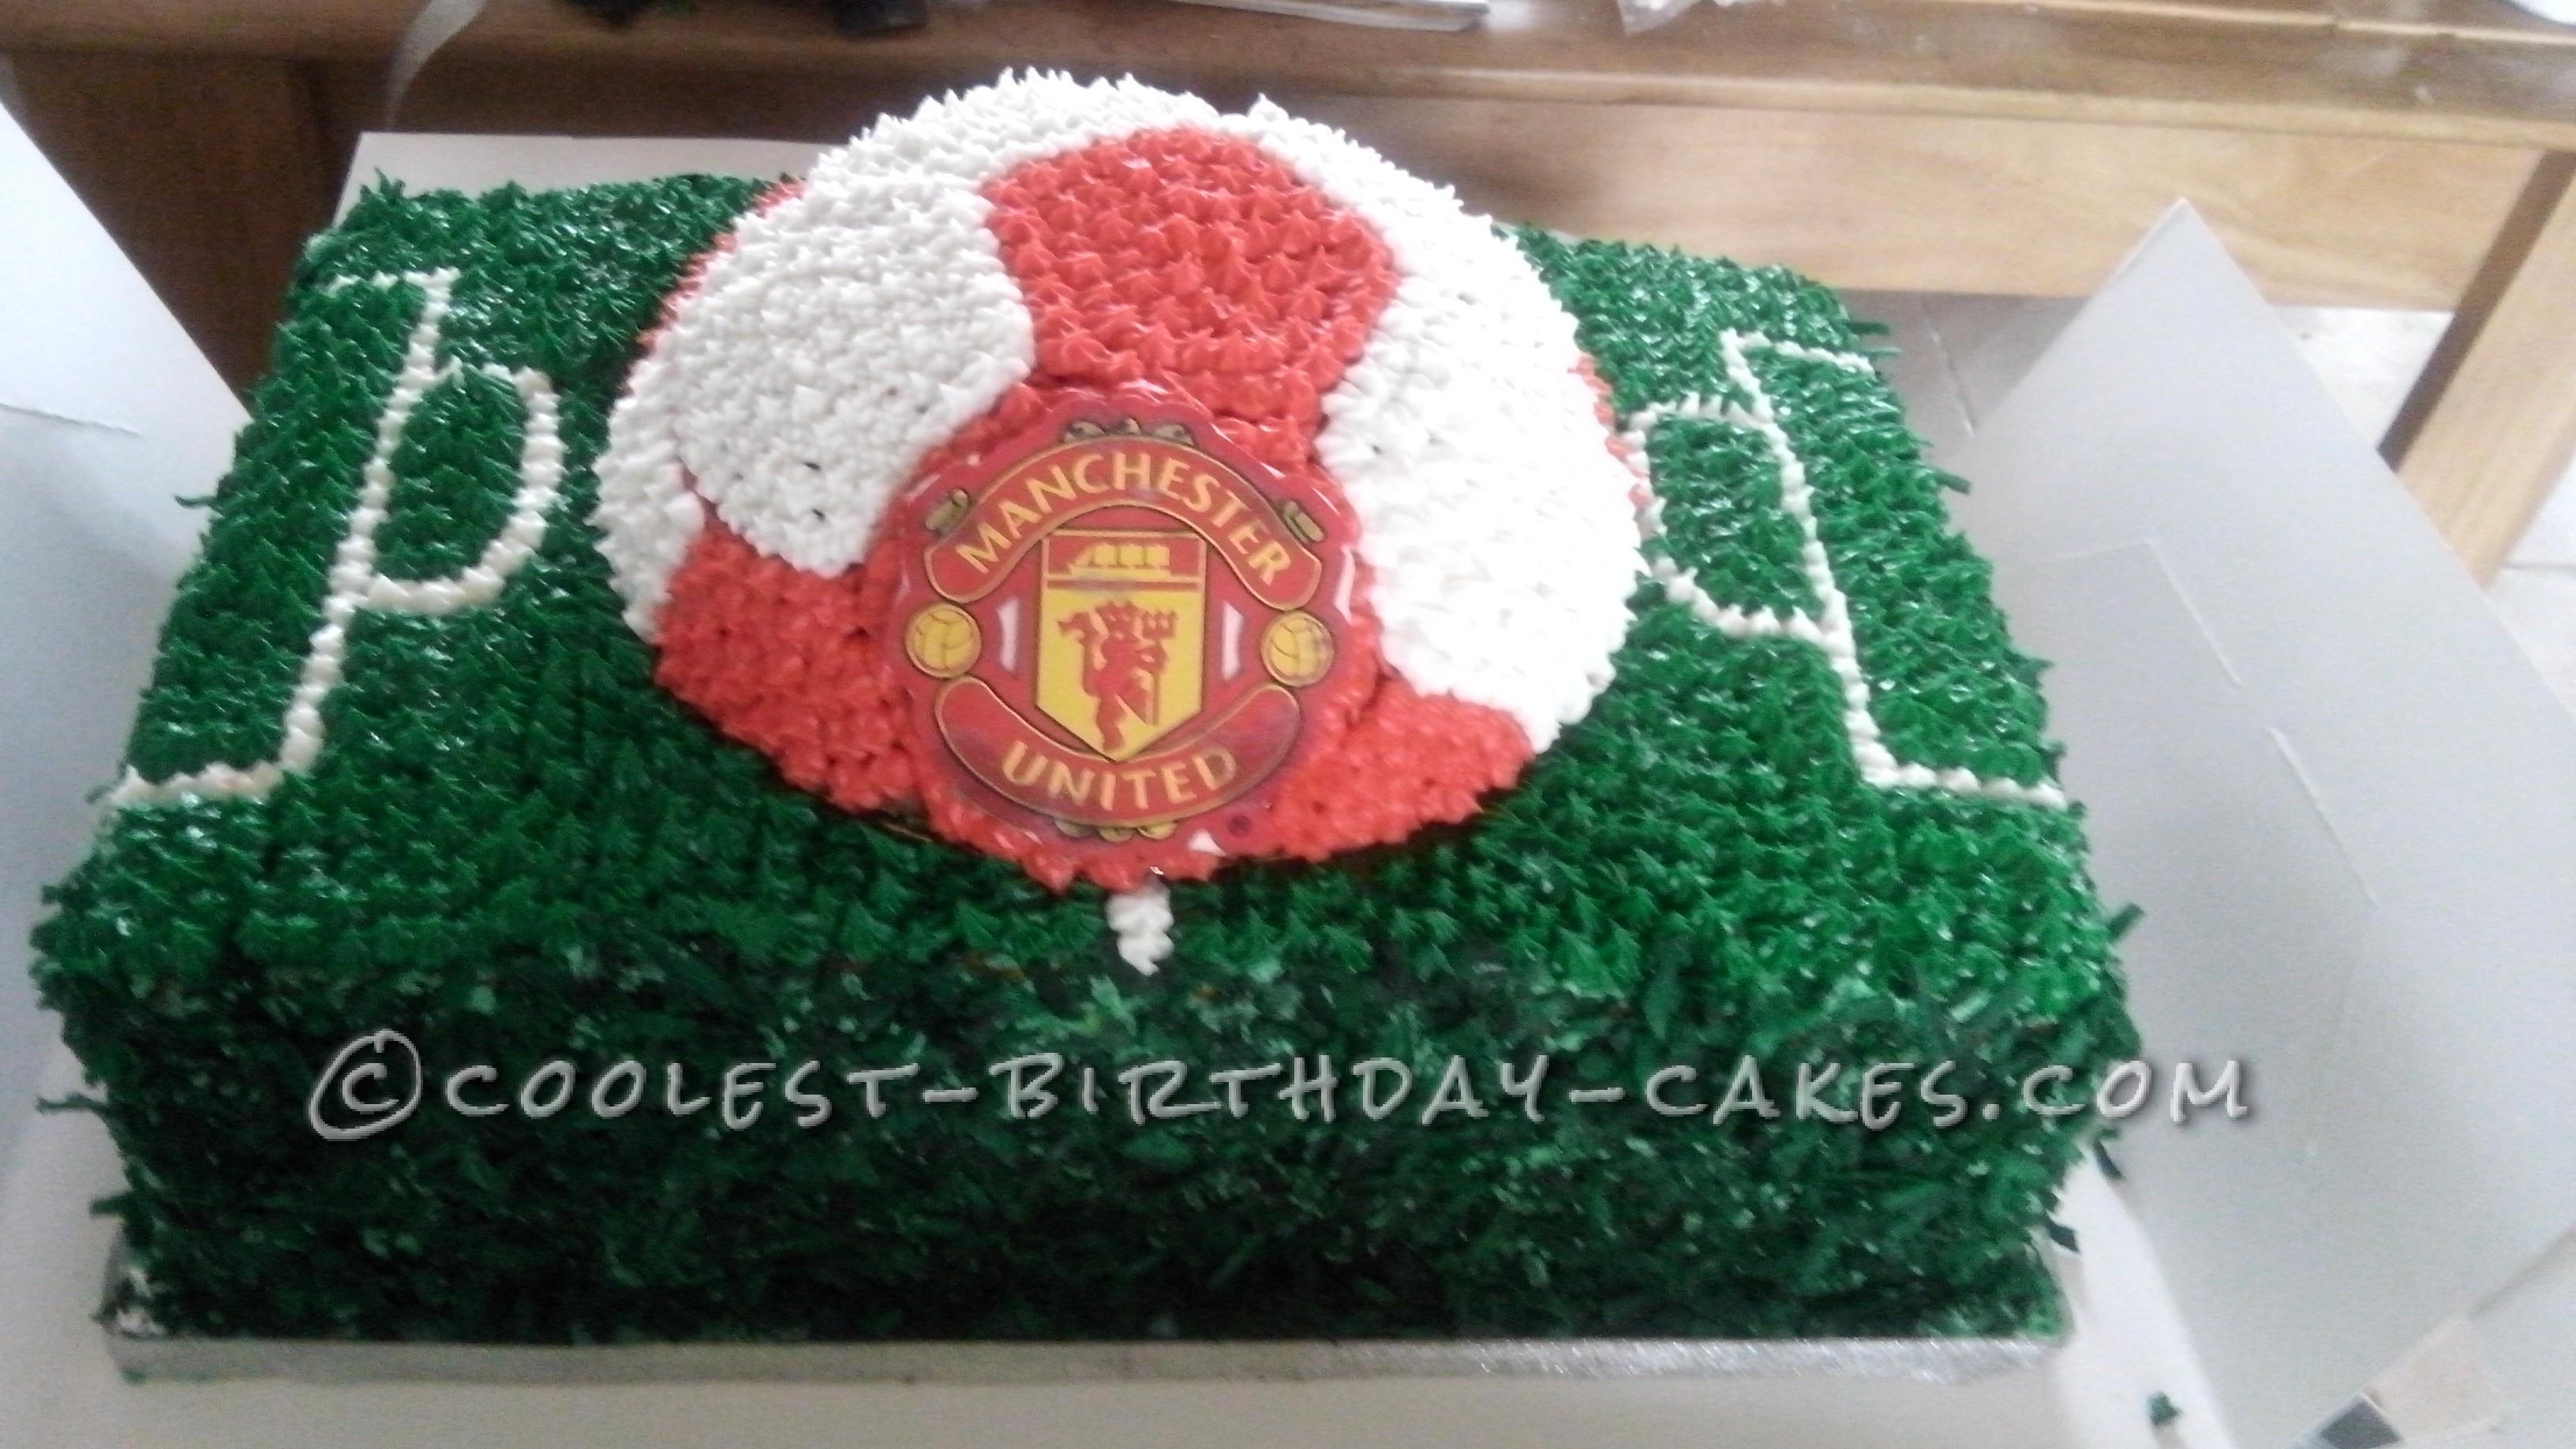 Cool Soccer Cake Made with Wilton Cake Pan